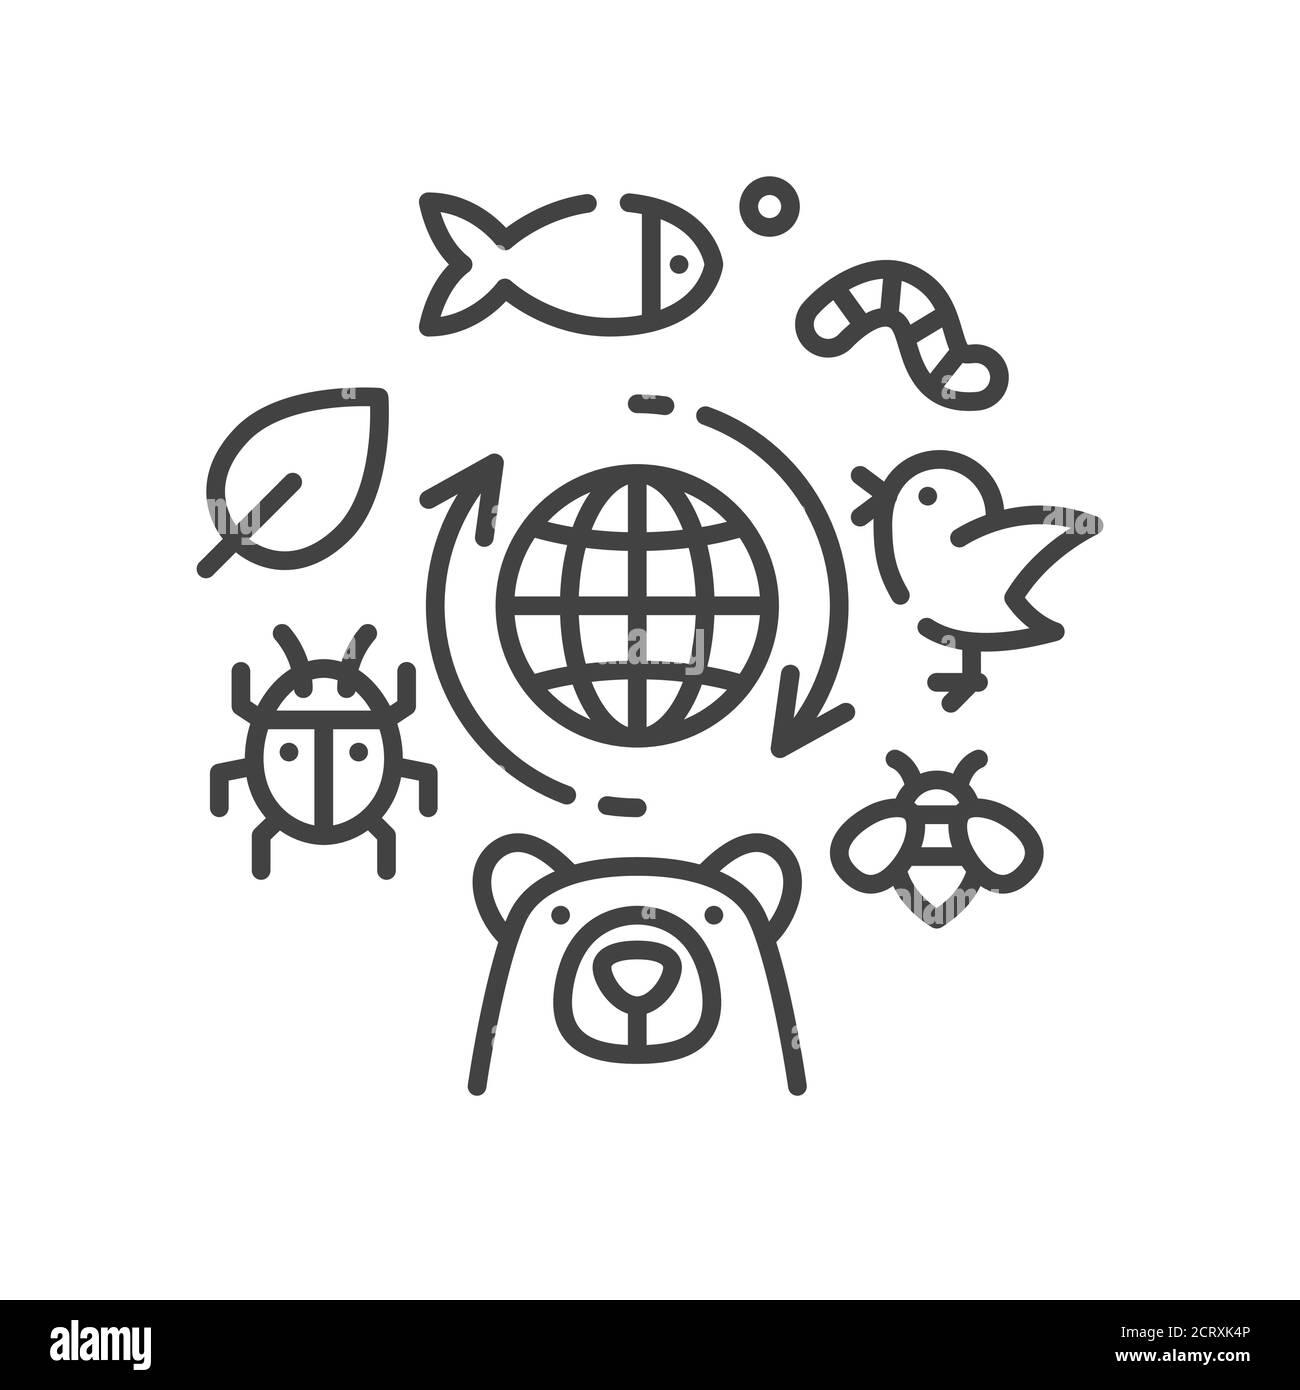 Environmental Issues Clip Art by Studio Devanna | TpT